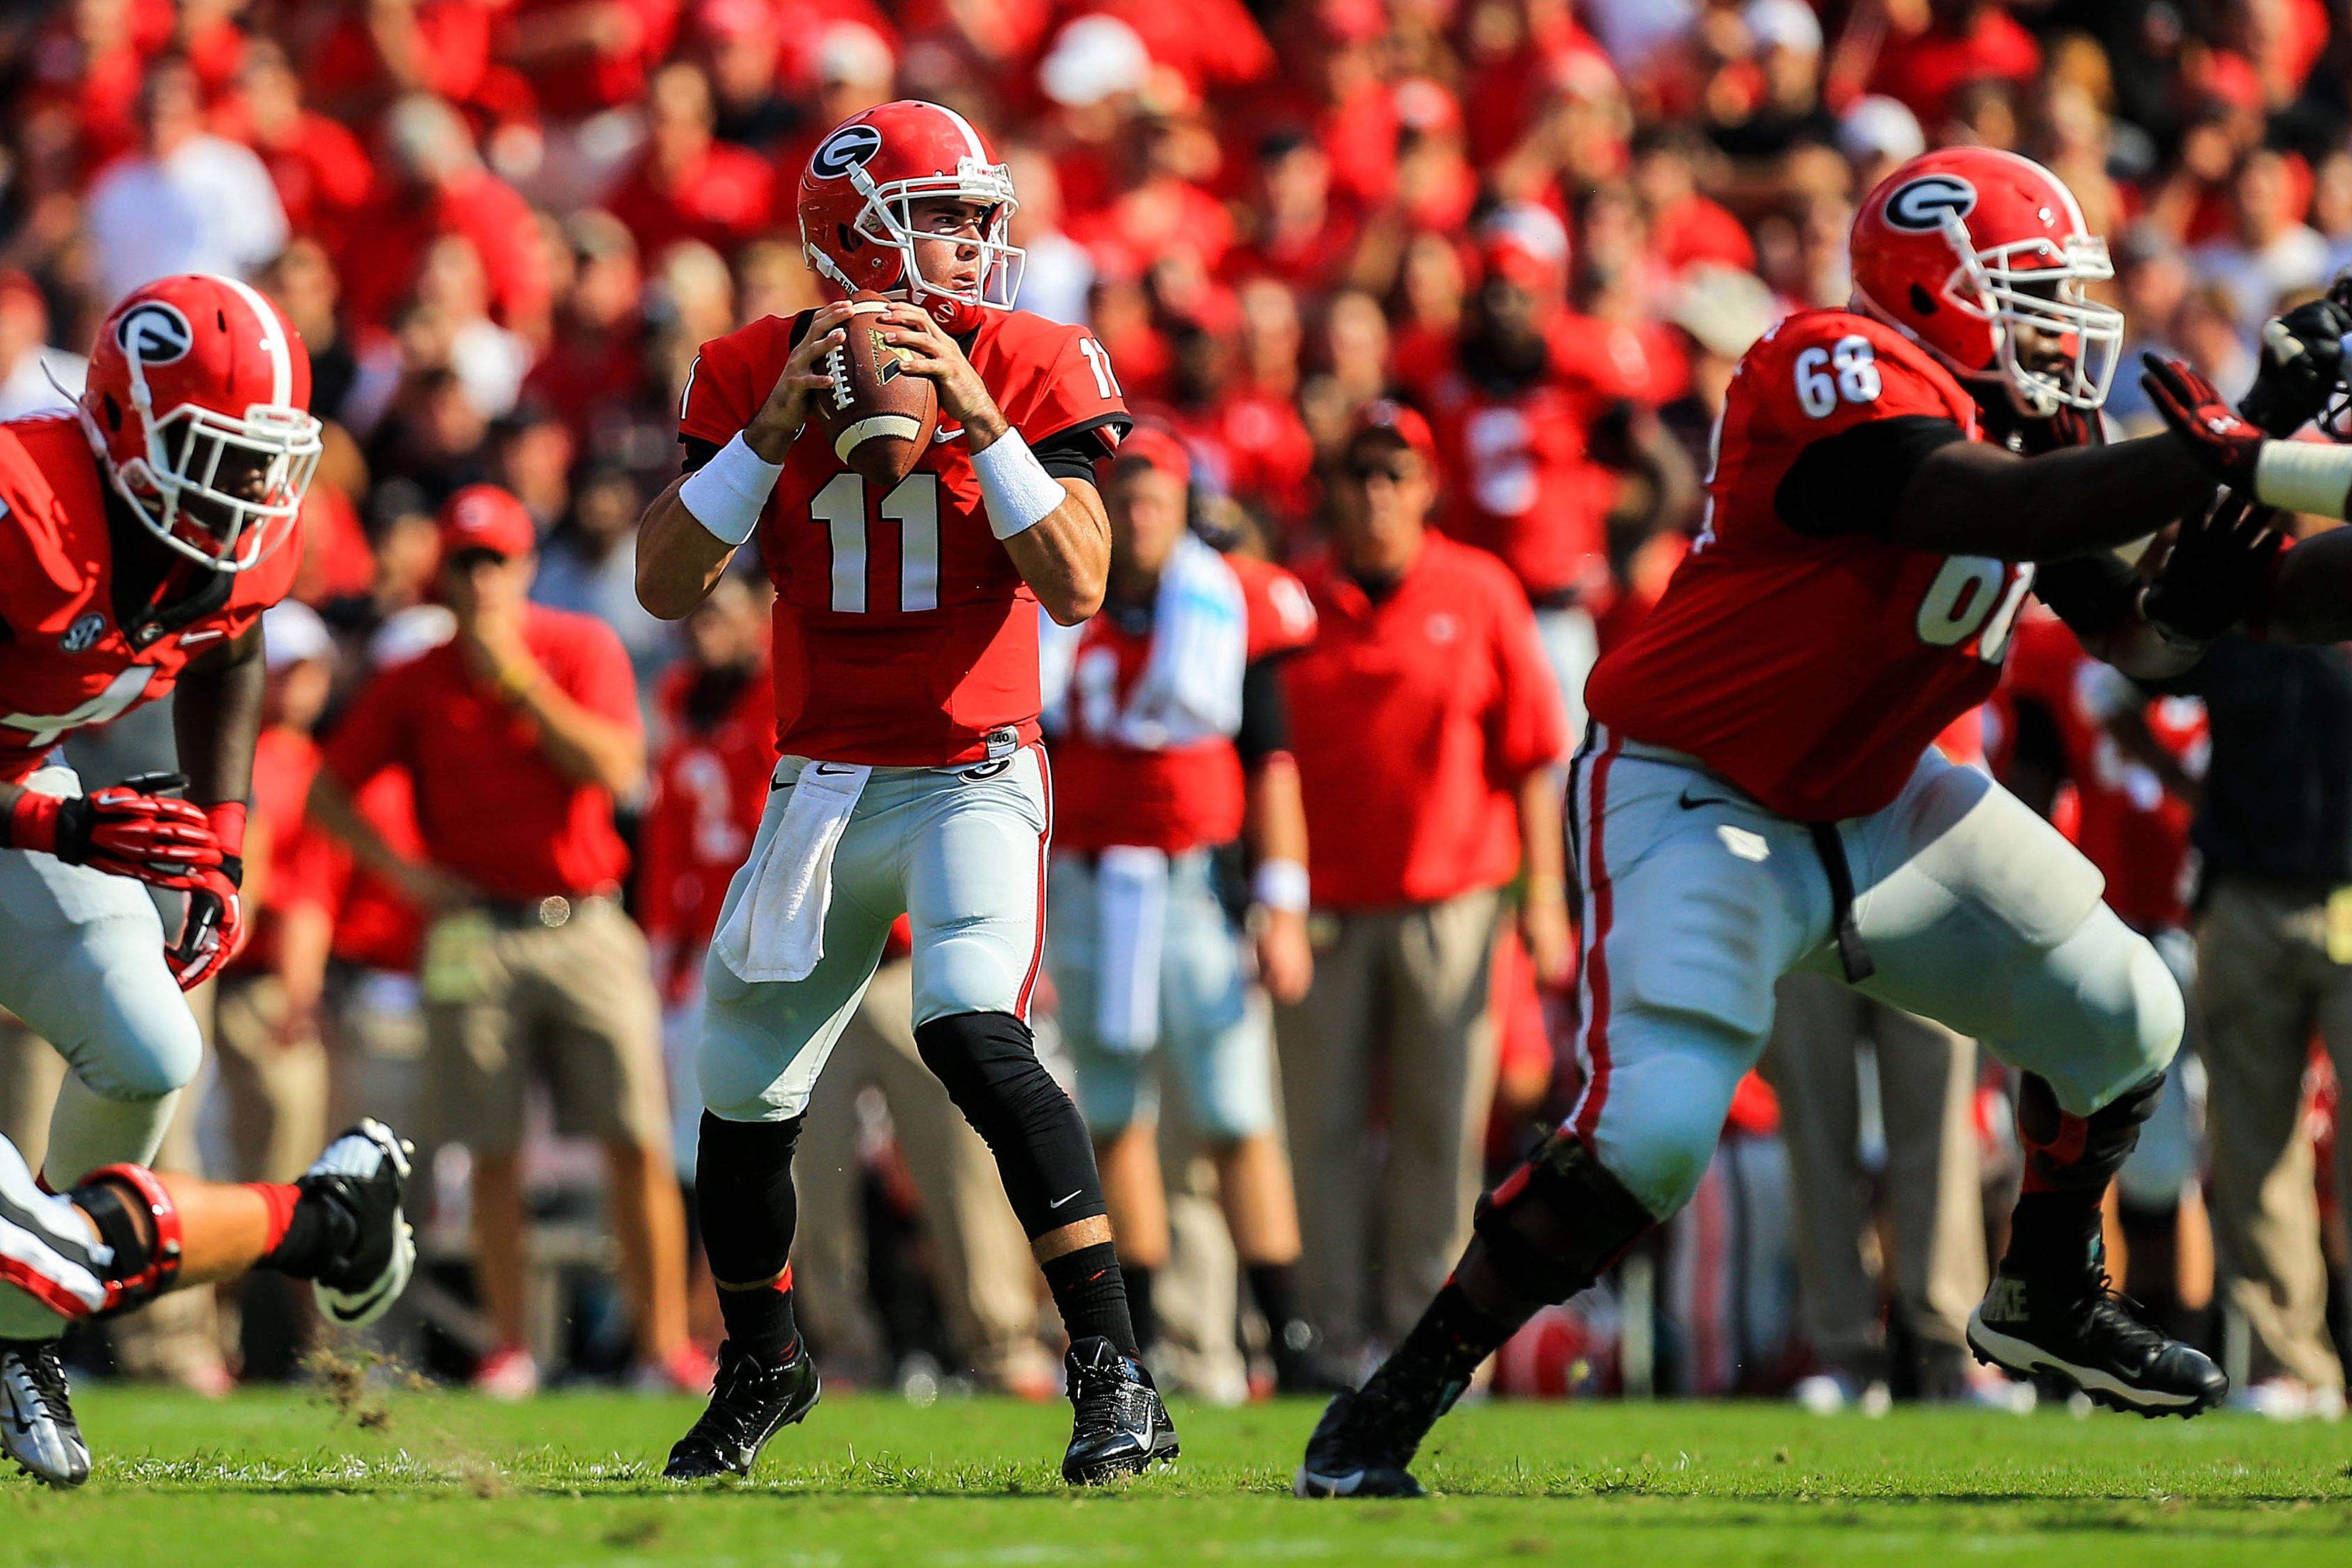 South Carolina vs. Georgia 2013 game recap: Bulldogs earn 41-30 victory